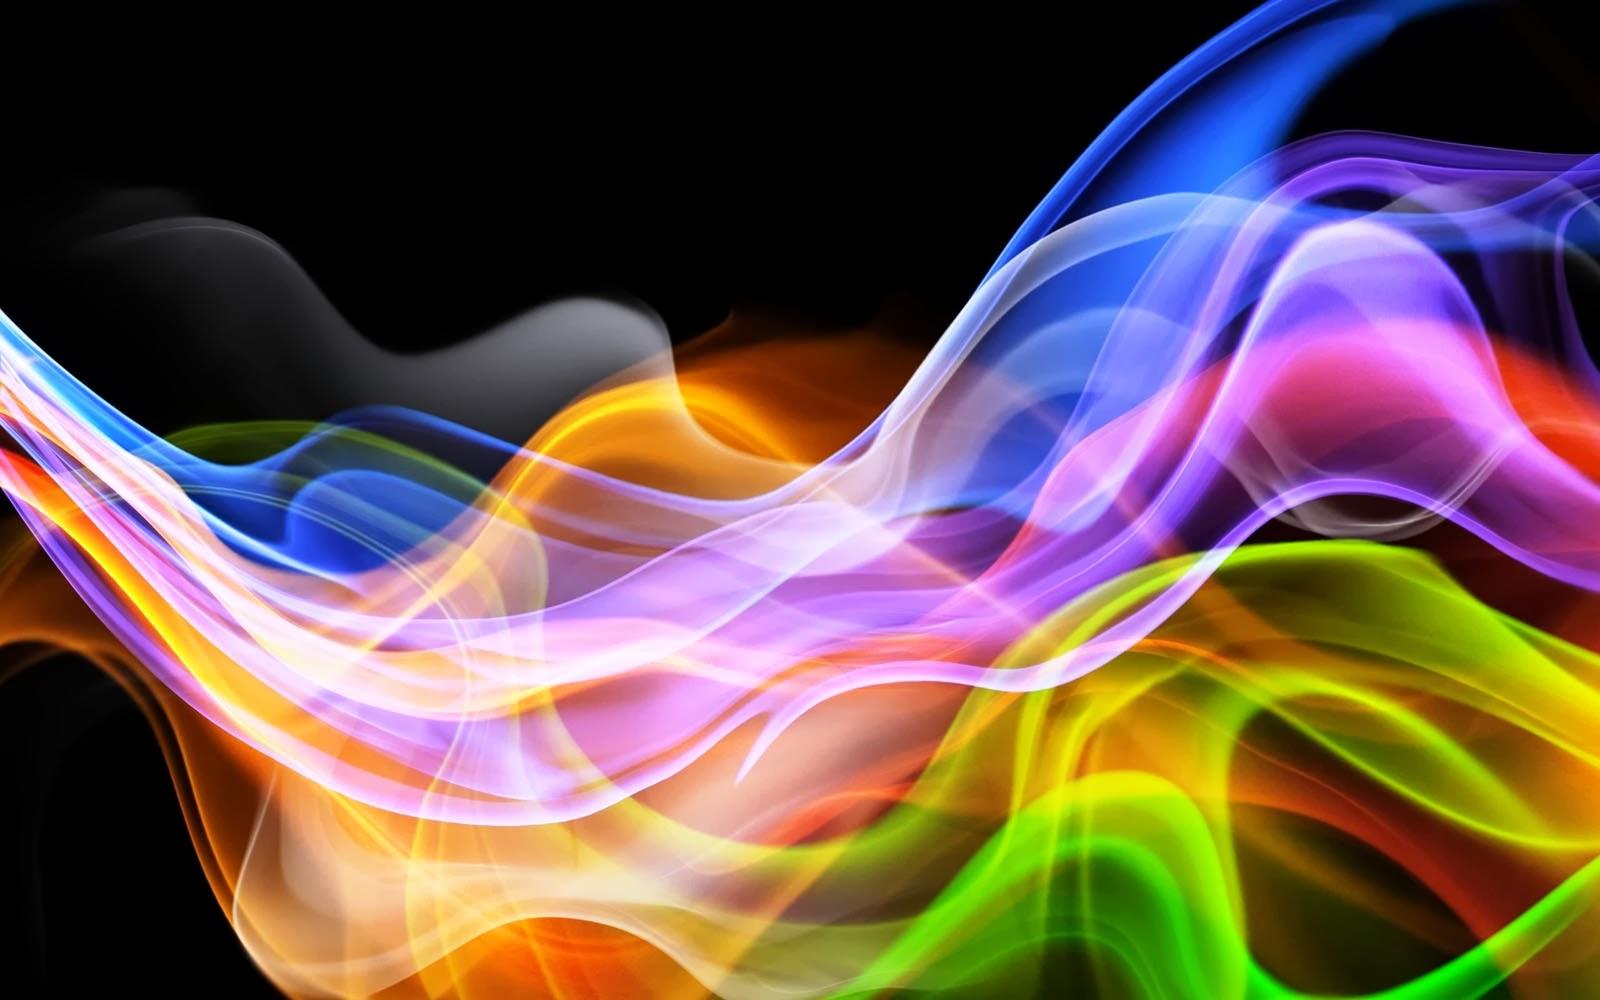 Colorful Smoke Wallpapers Colorful Smoke Desktop Wallpapers Colorful 1600x1000